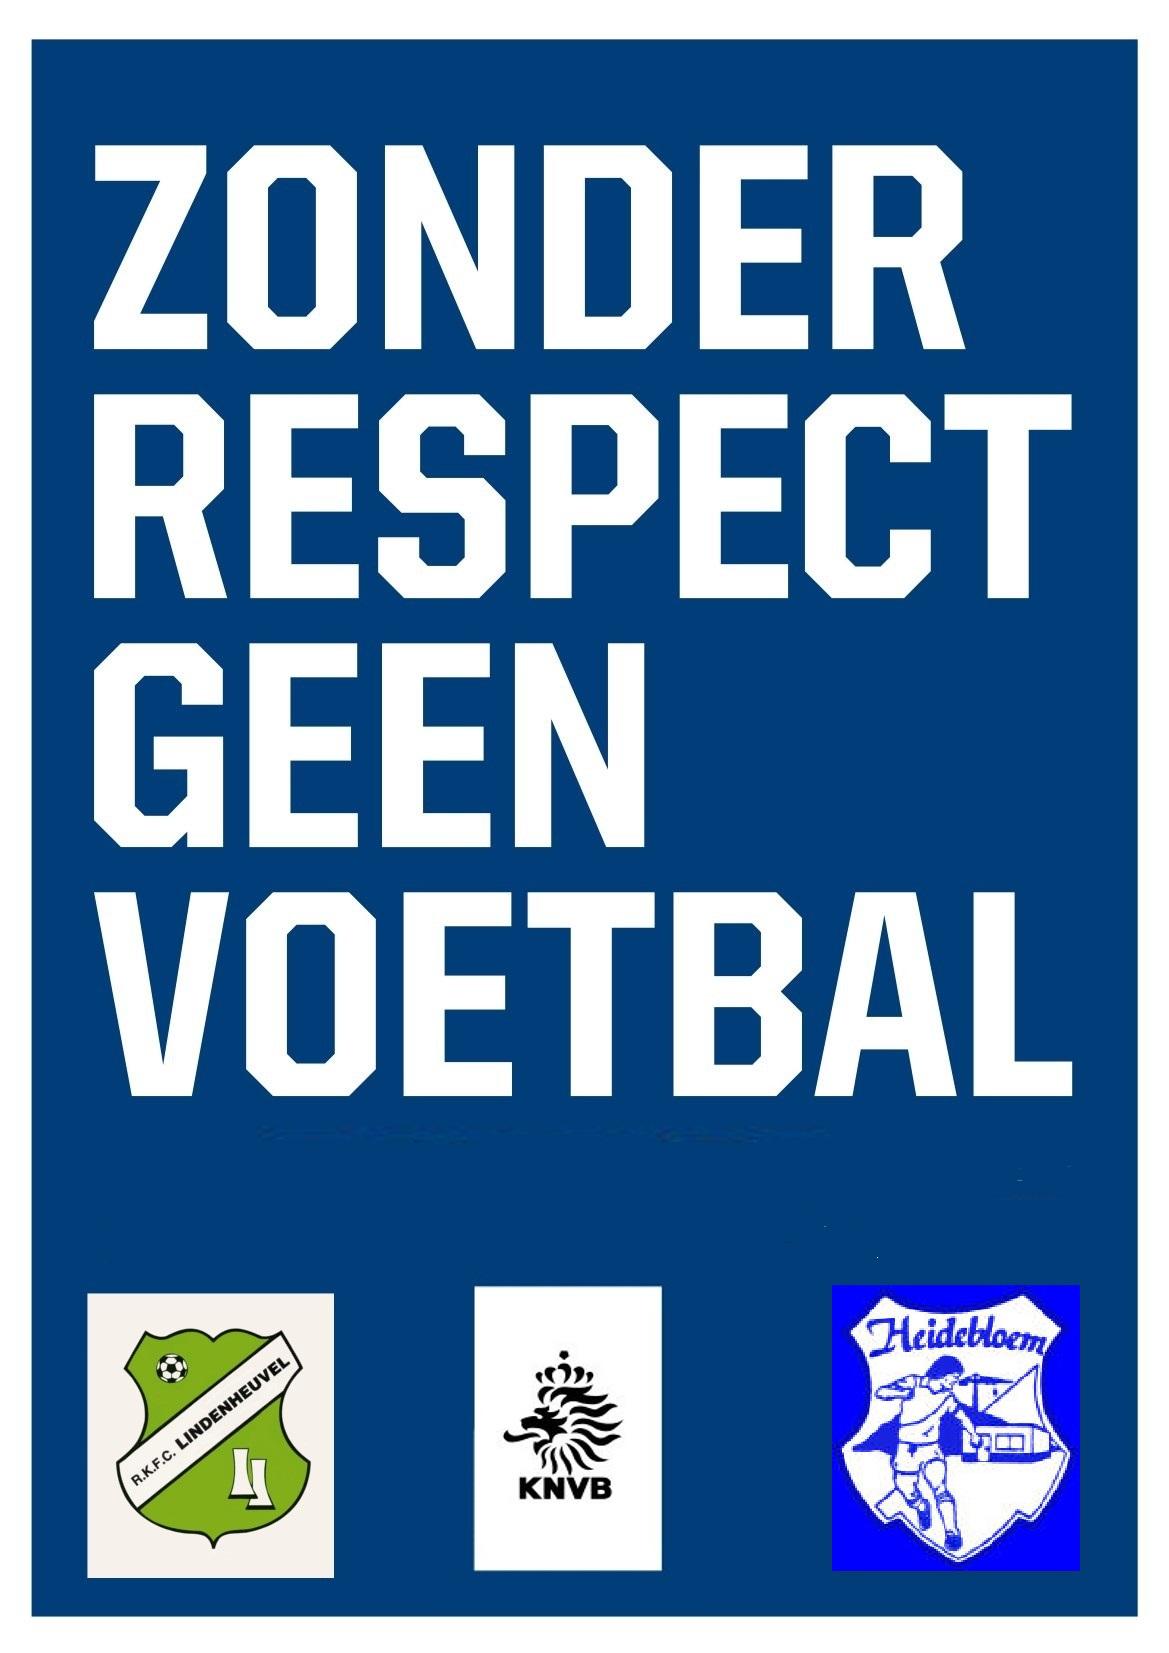 Poster Zonder respect geen voetbal rkfc (aangepast).jpg